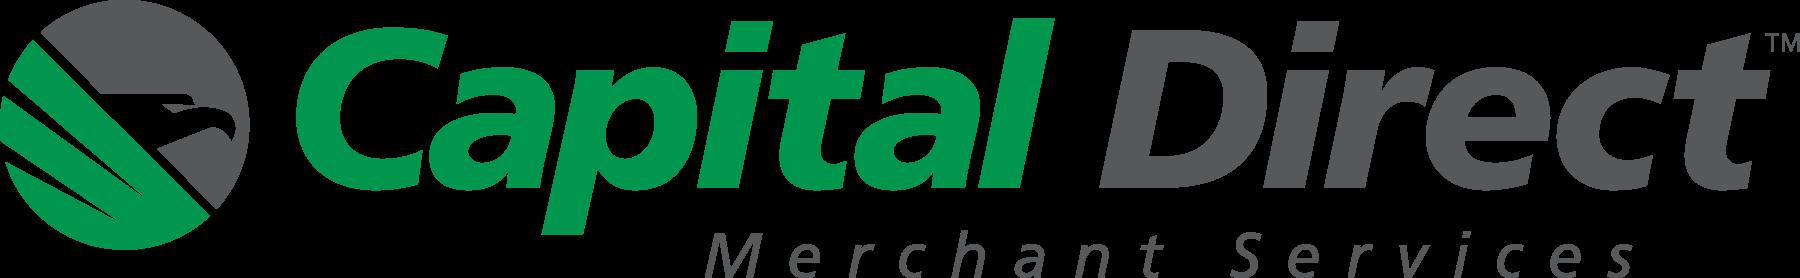 Capital Direct Merchant Services